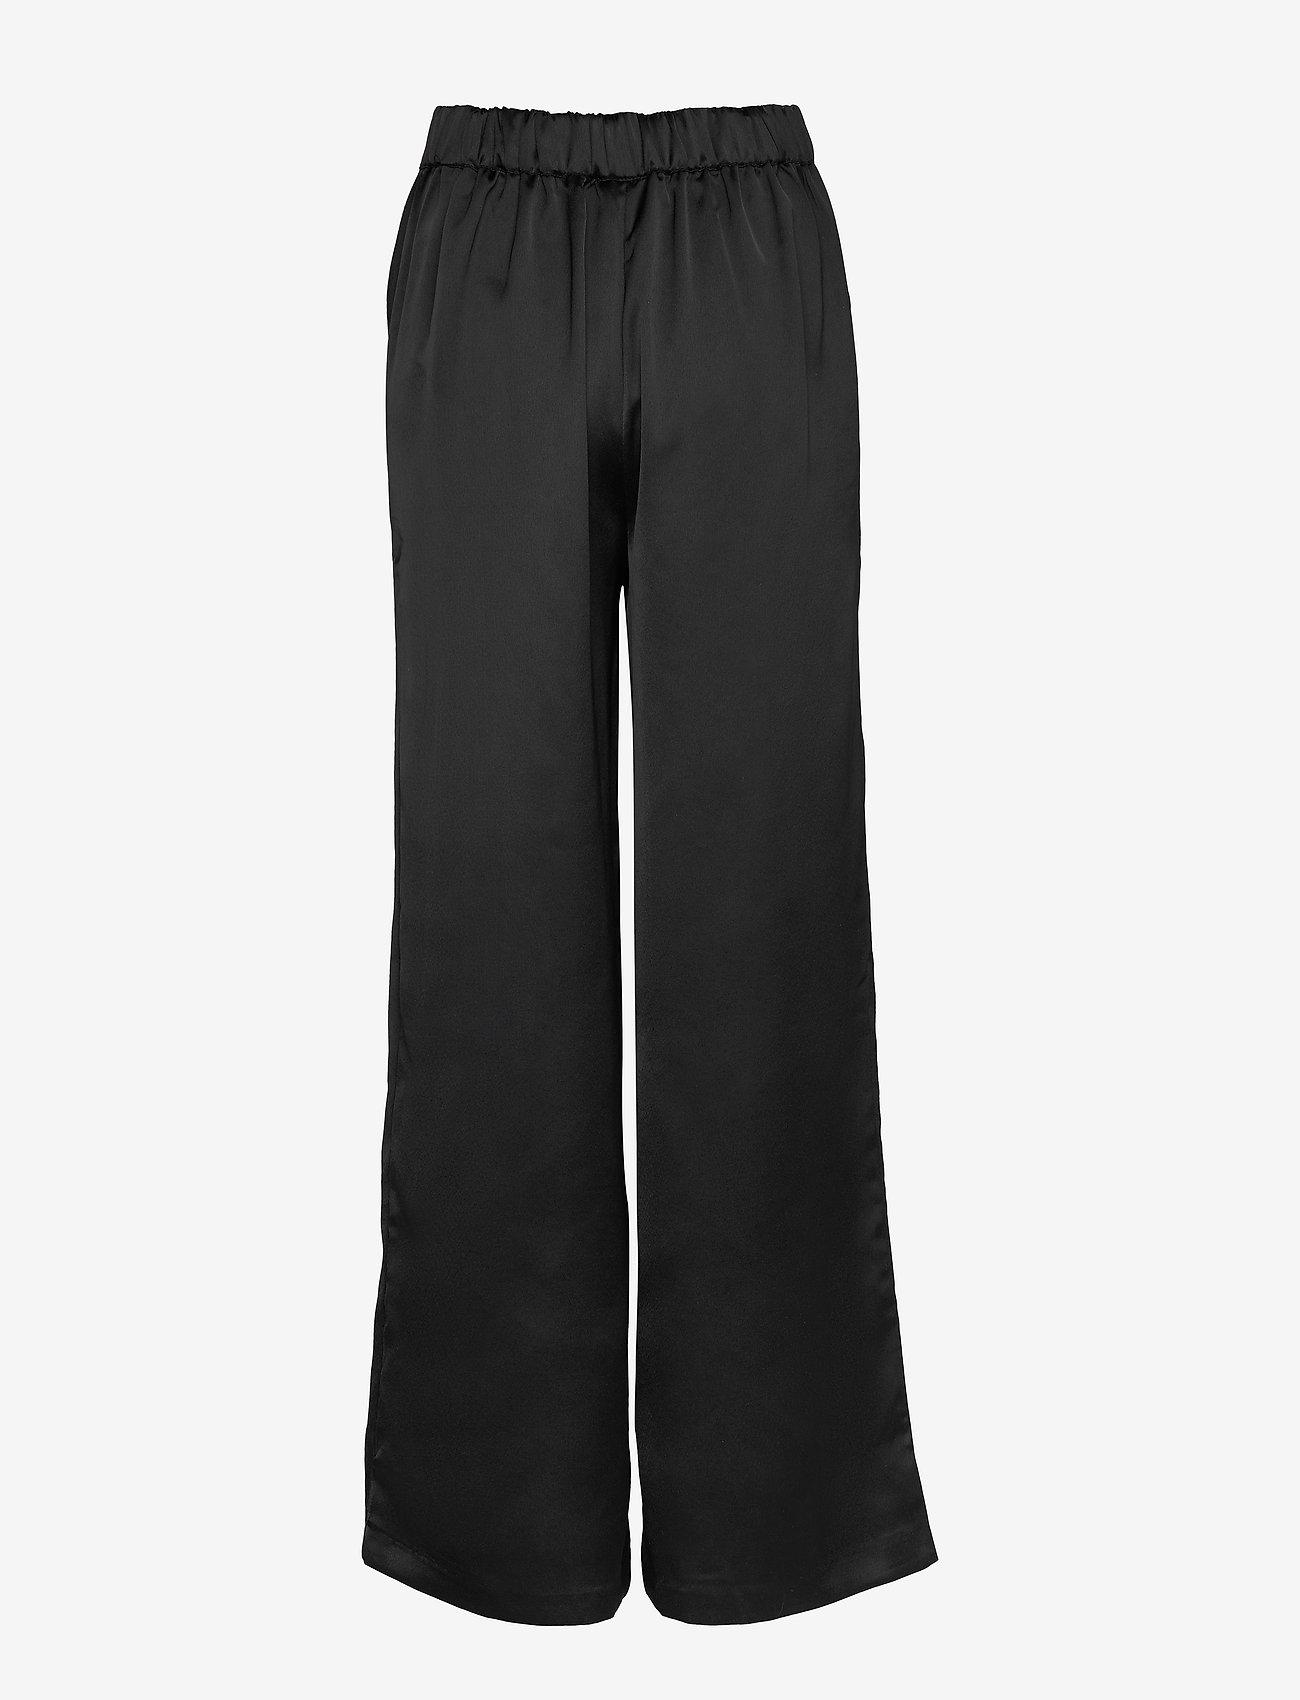 Vila - VIALICE HWRE PANTS - vide bukser - black - 1